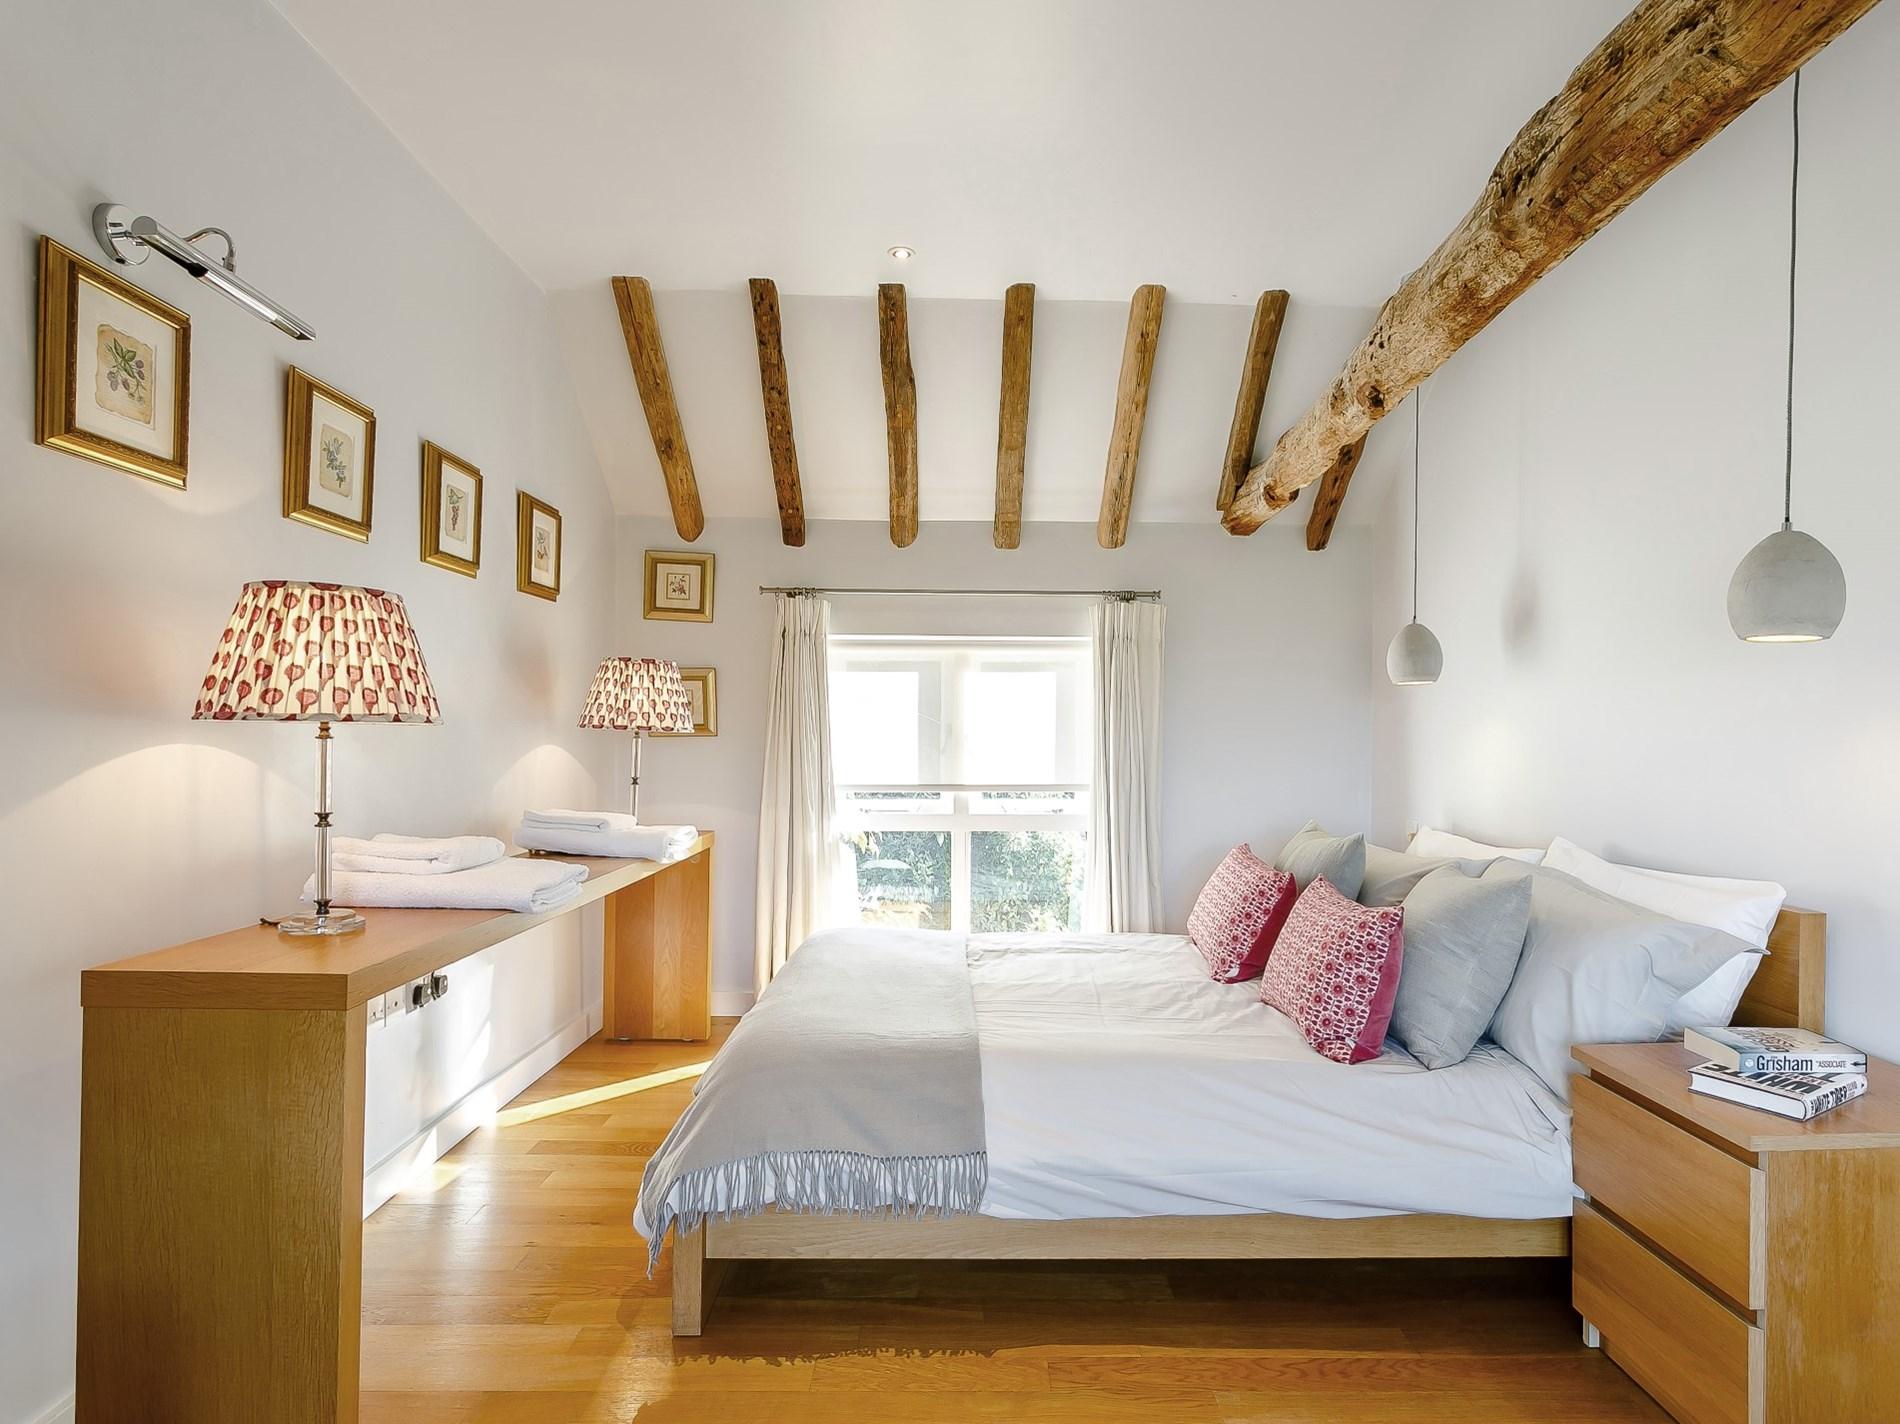 Beautifully furnished bedroom with en-suite bathroom